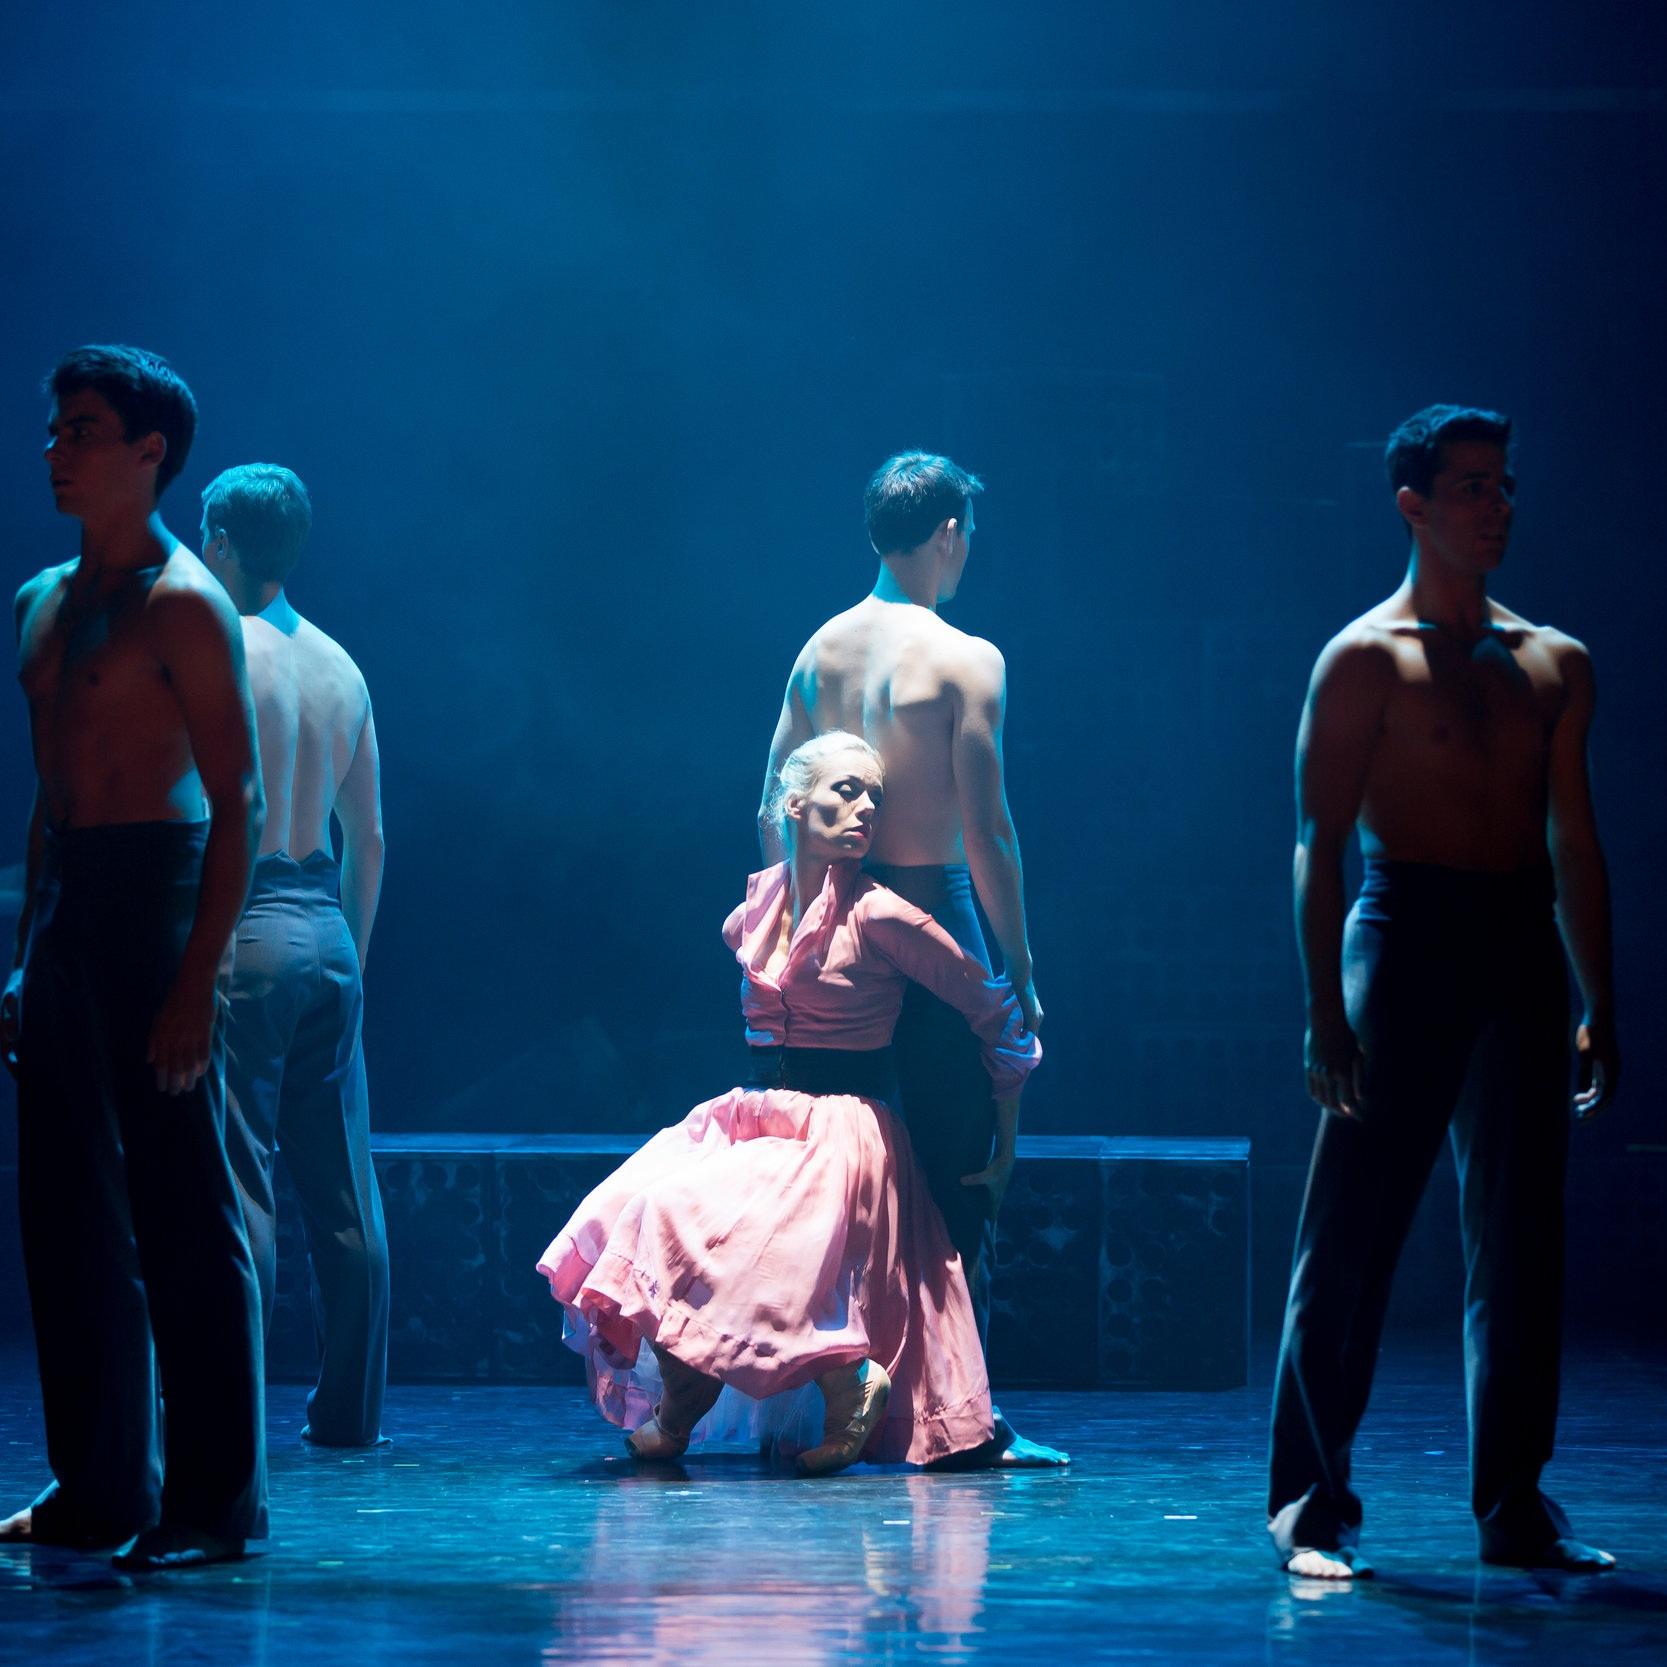 Photo courtesy of Scottish Ballet (2015)